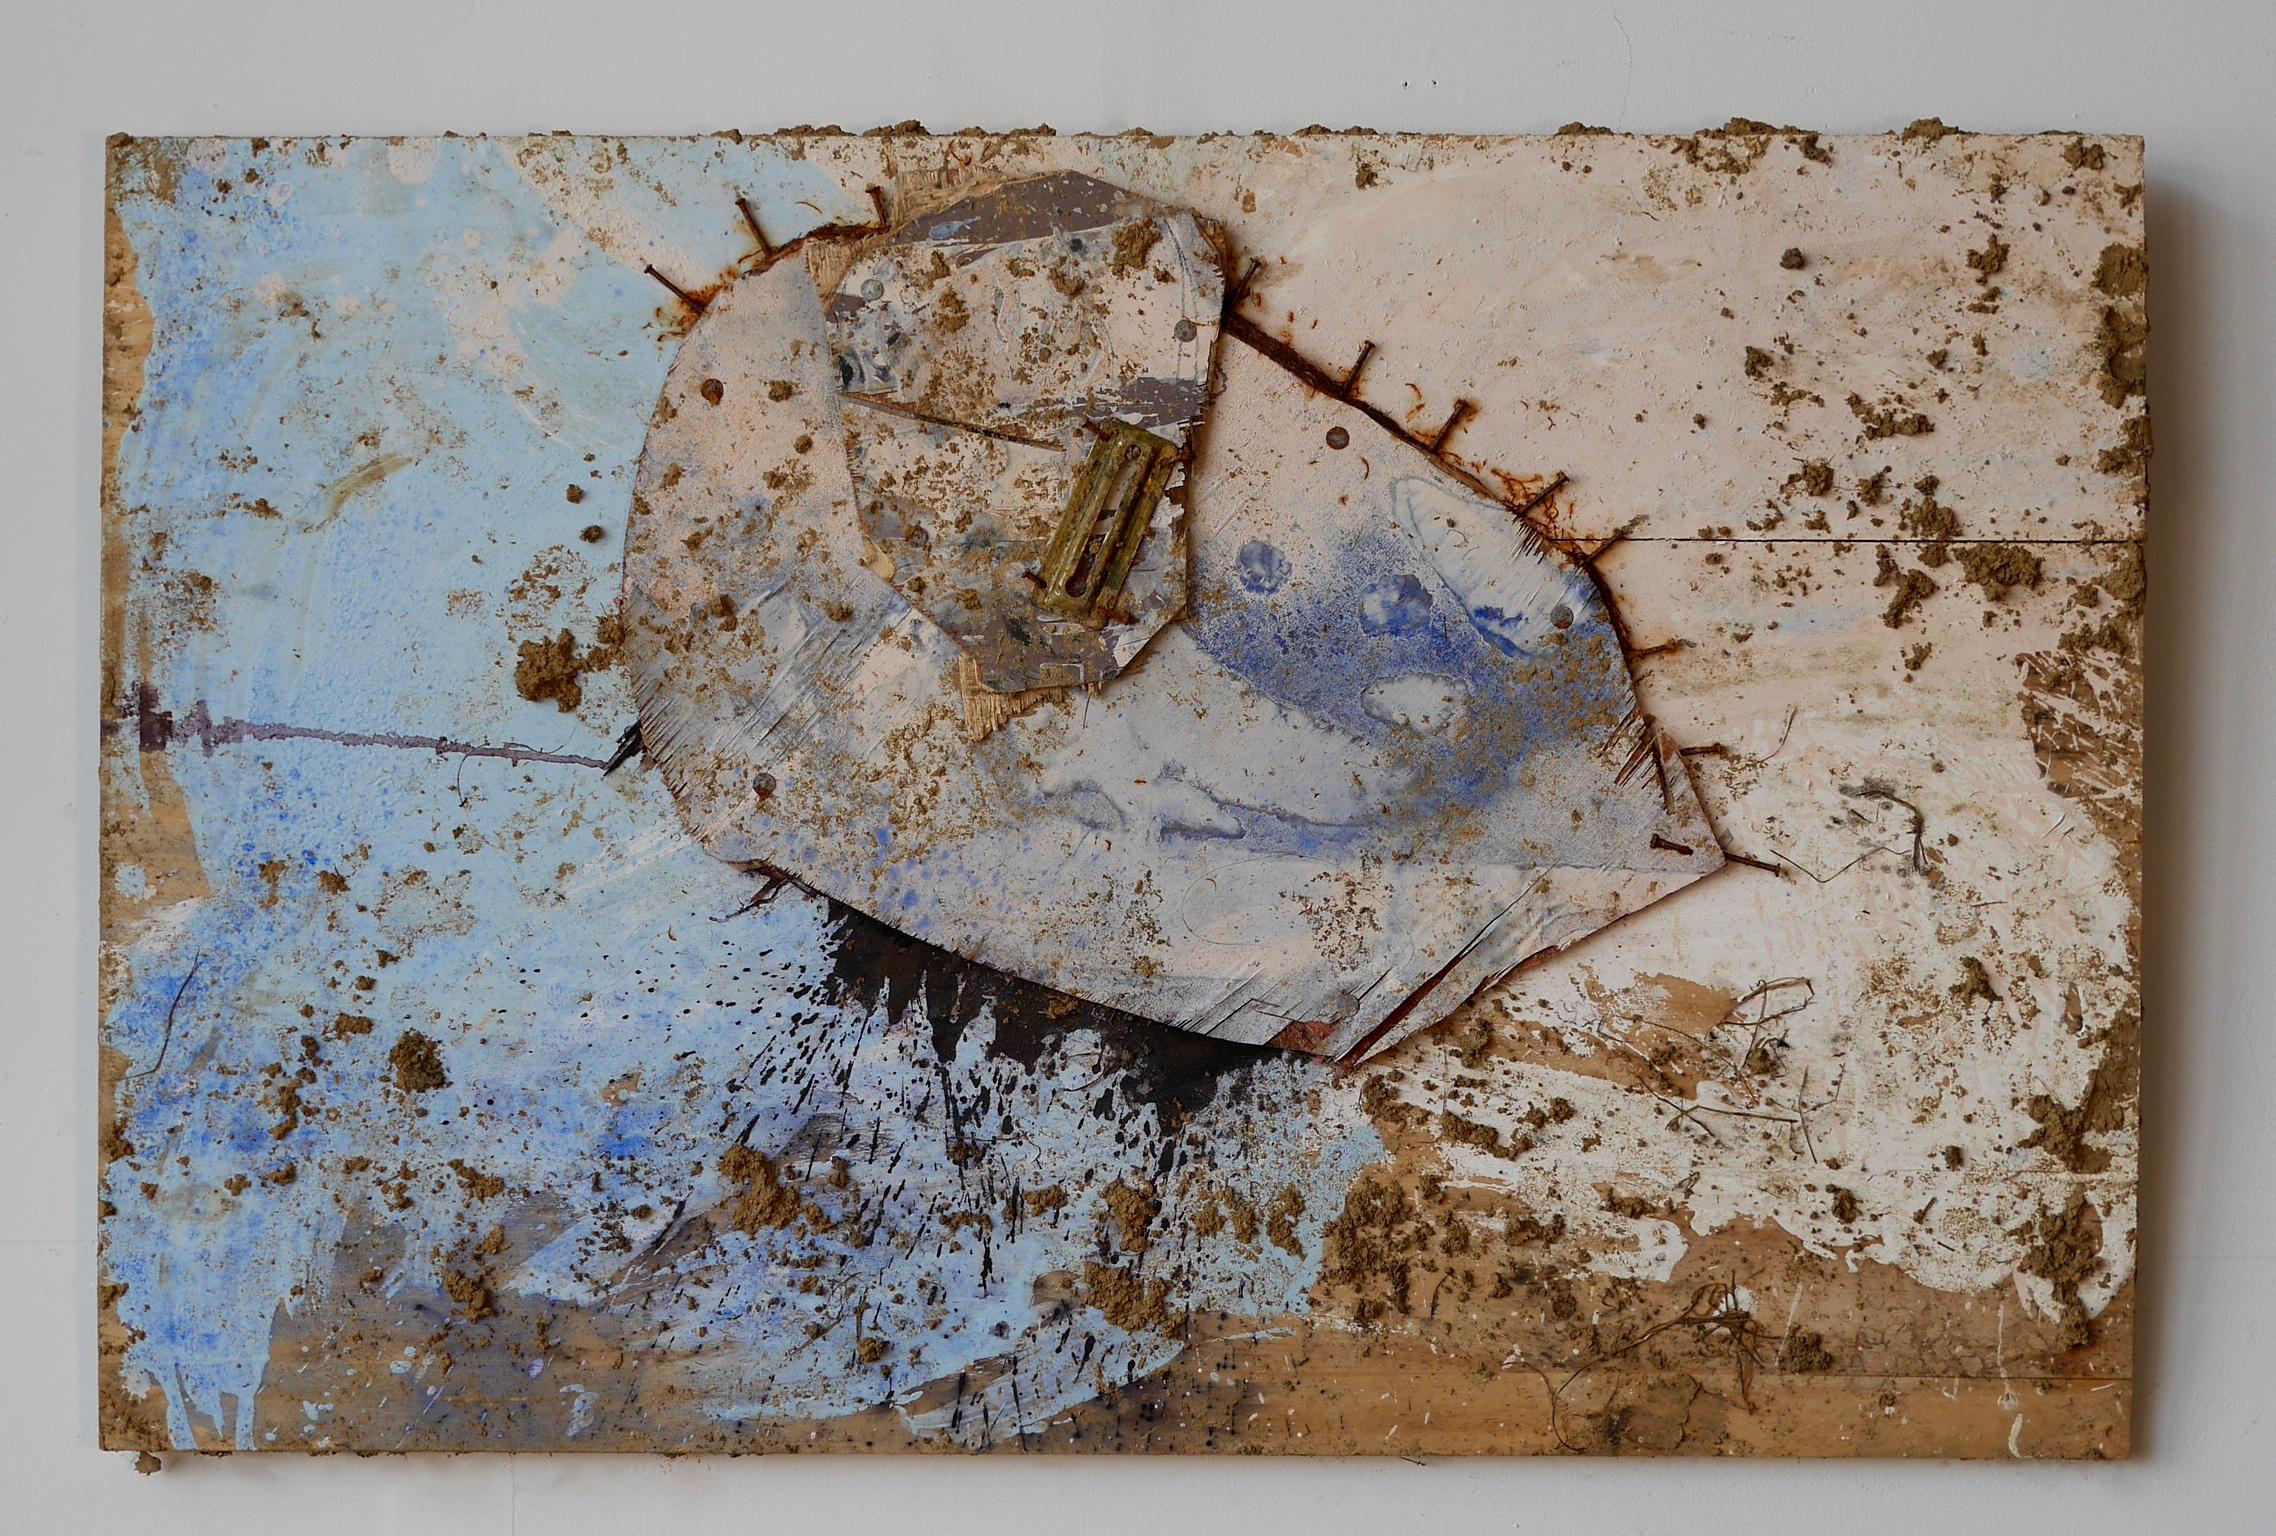 "Number 1 - The Opposite of Trying  24"" x 32""  Chain lock (half), steel wool, nails, wood, acrylic, milk, vinegar, salt, ink, dye, white flour, rust, dirt, mold on wood  (2015)"